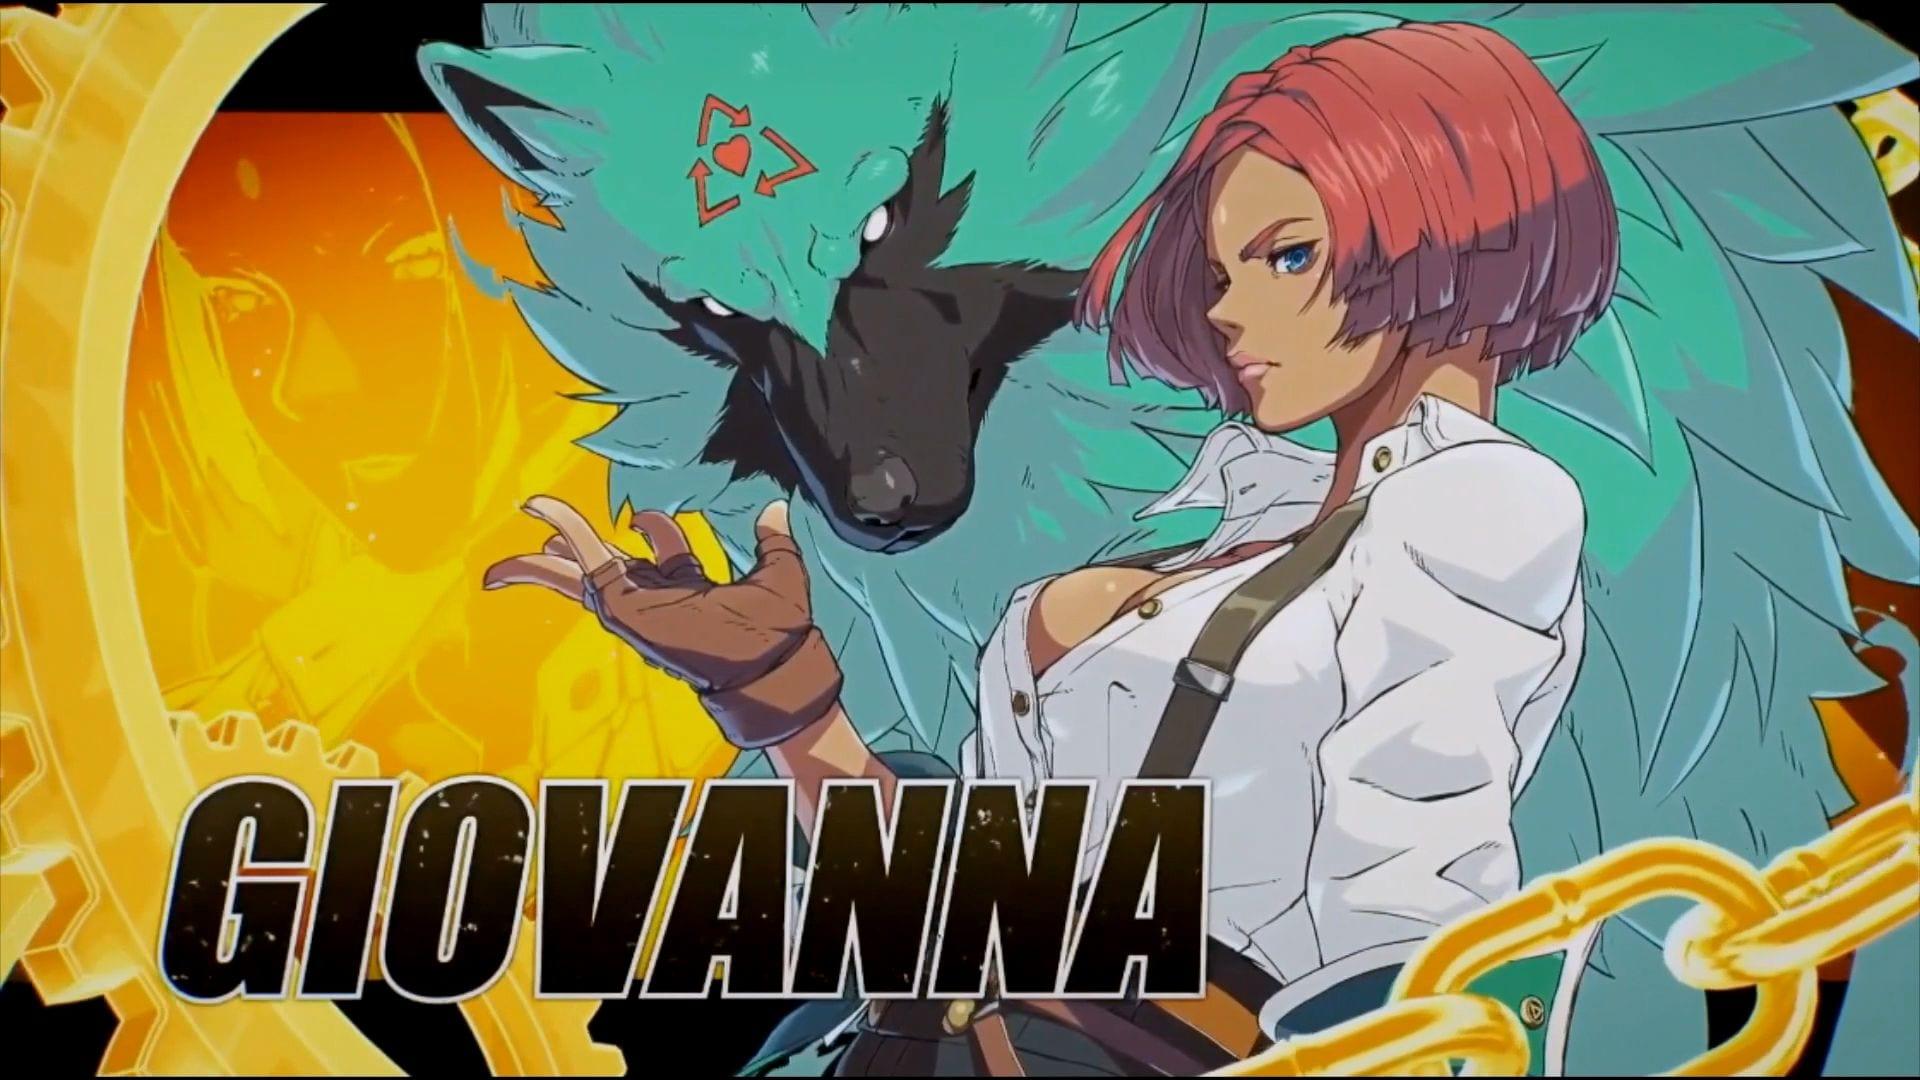 Guilty Gear Giovanna